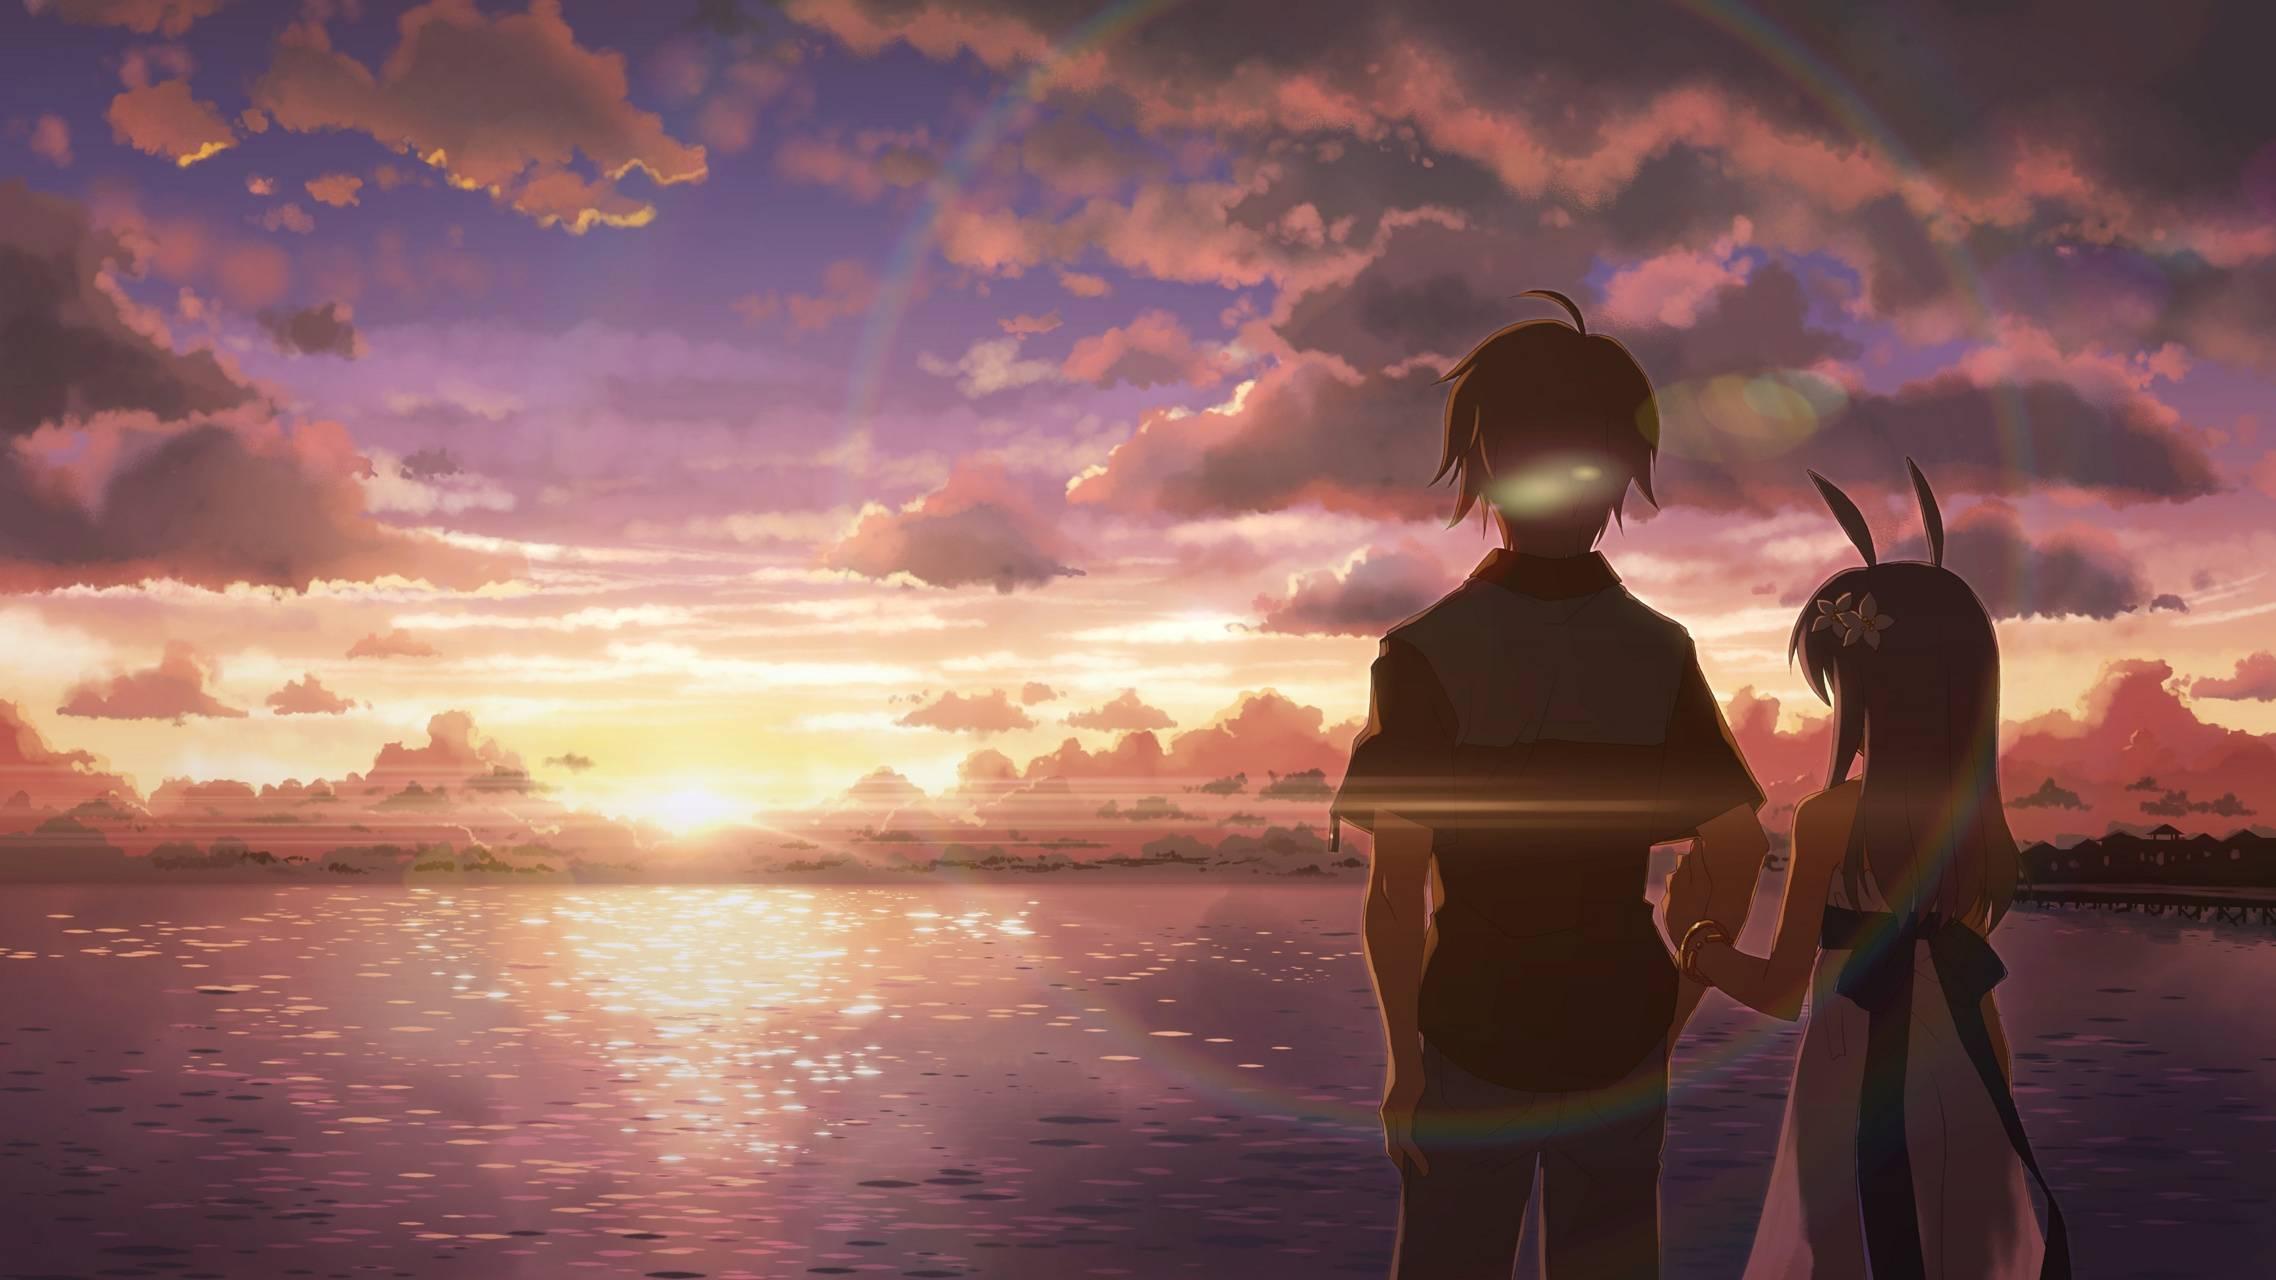 Anime sunset